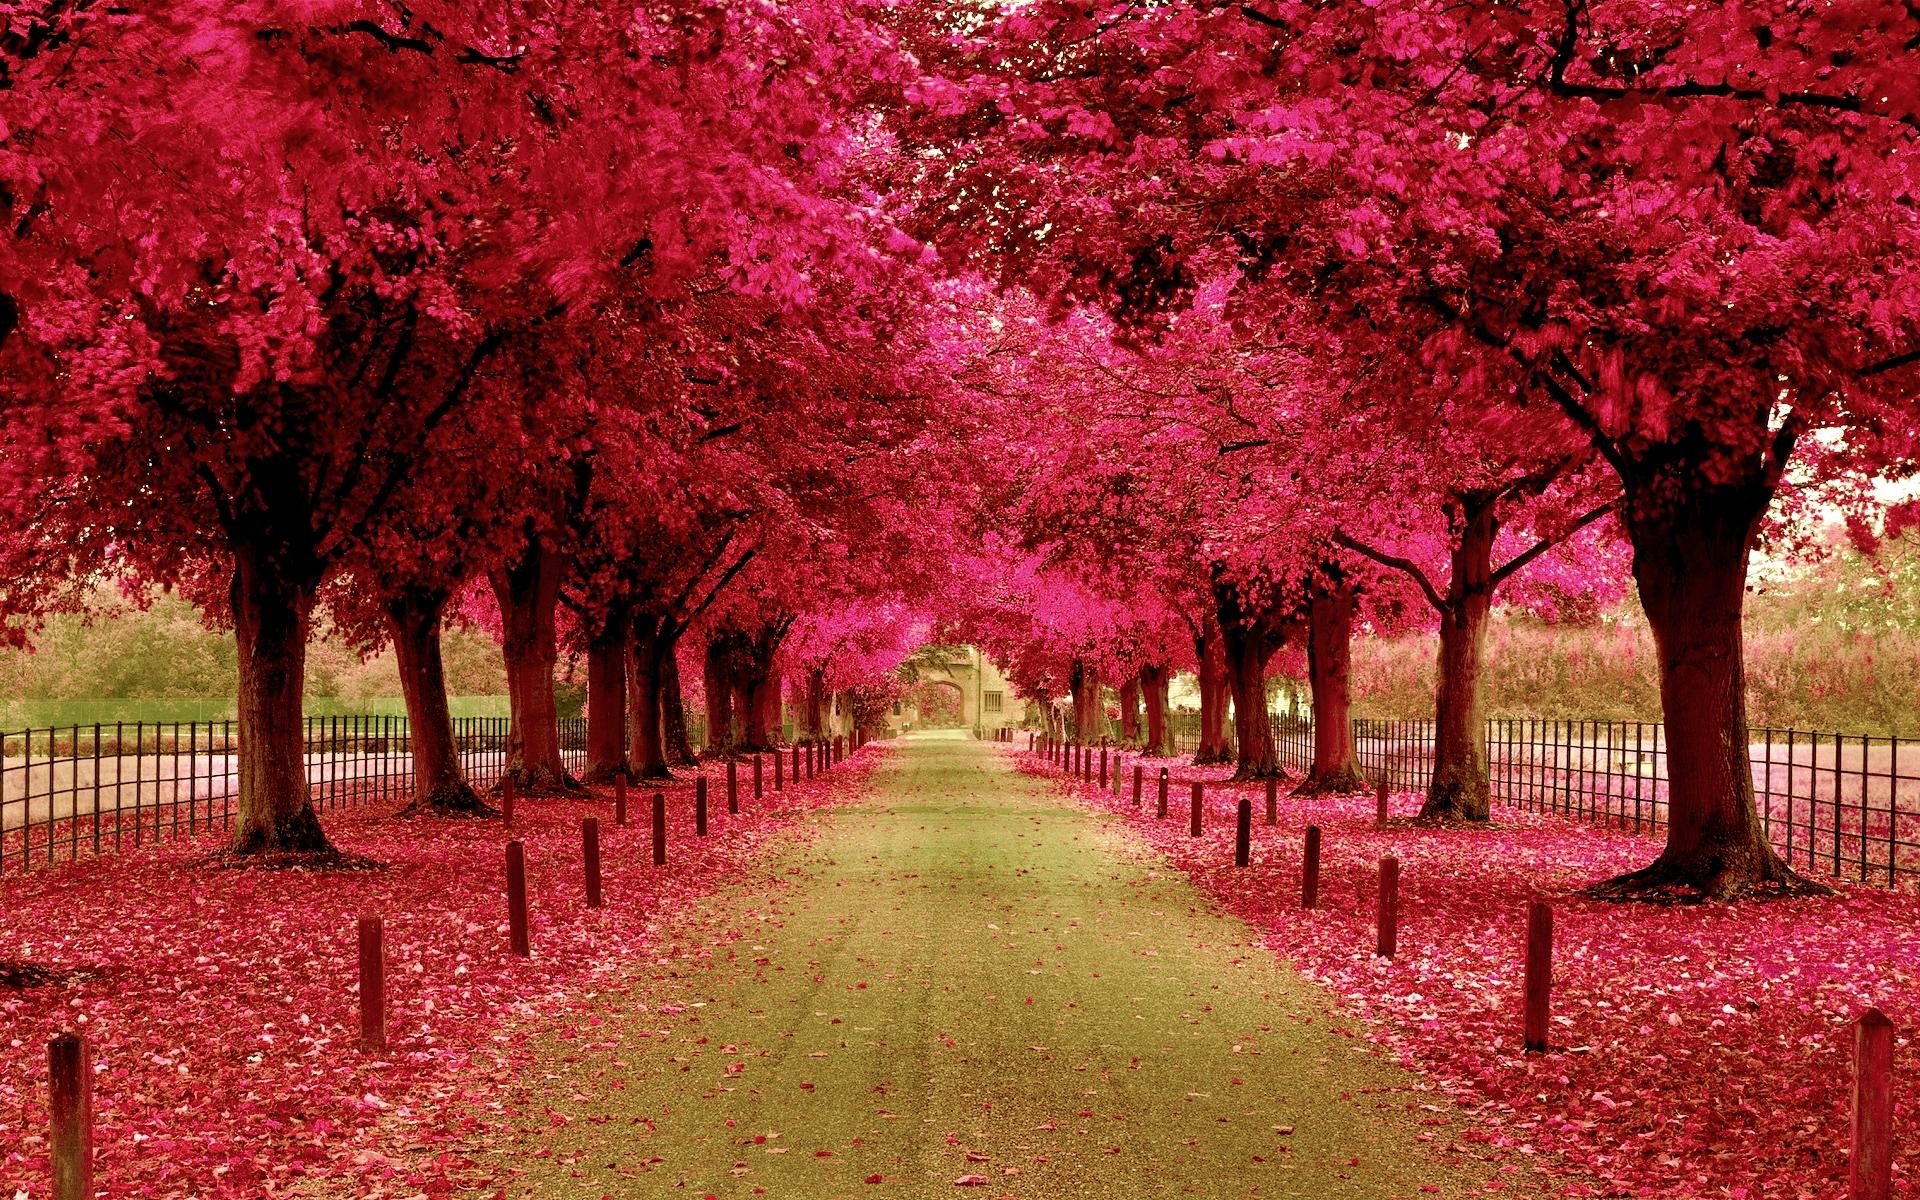 Hd wallpaper park - Photography Park Walkway Tree Fall Pink Leaf Wallpaper